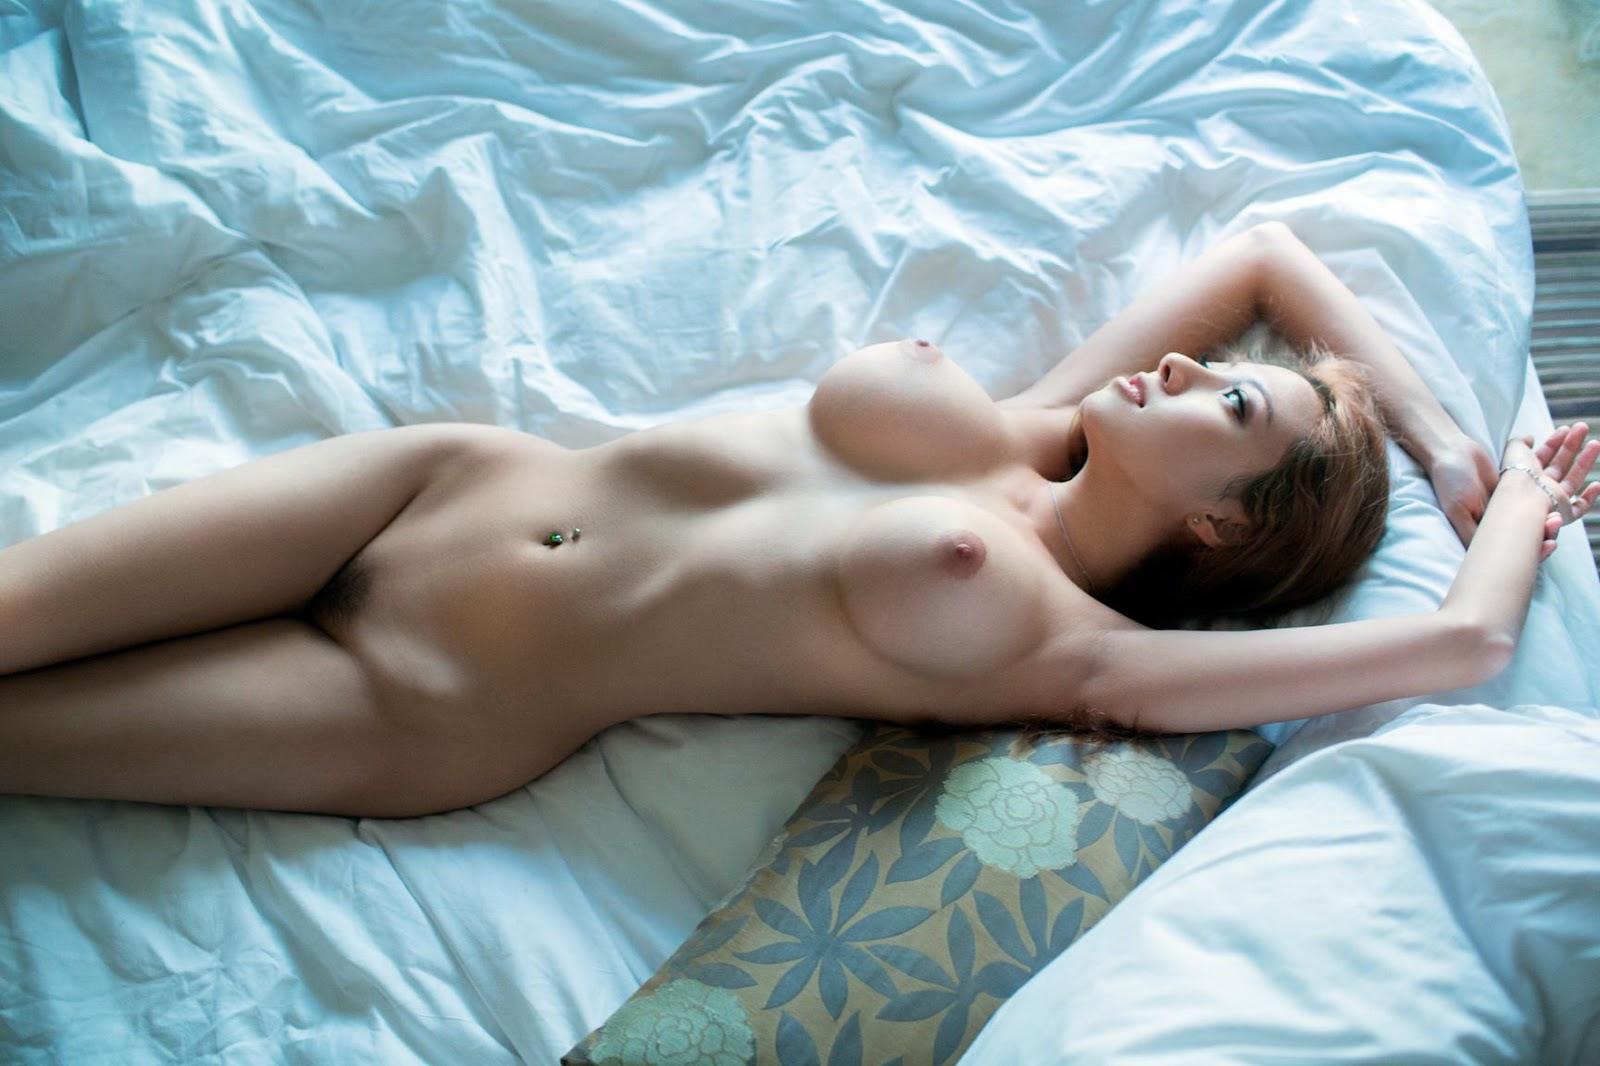 48%2B%252838%2529 - Sexy Girl Nude TUIGIRL NO.48 Model